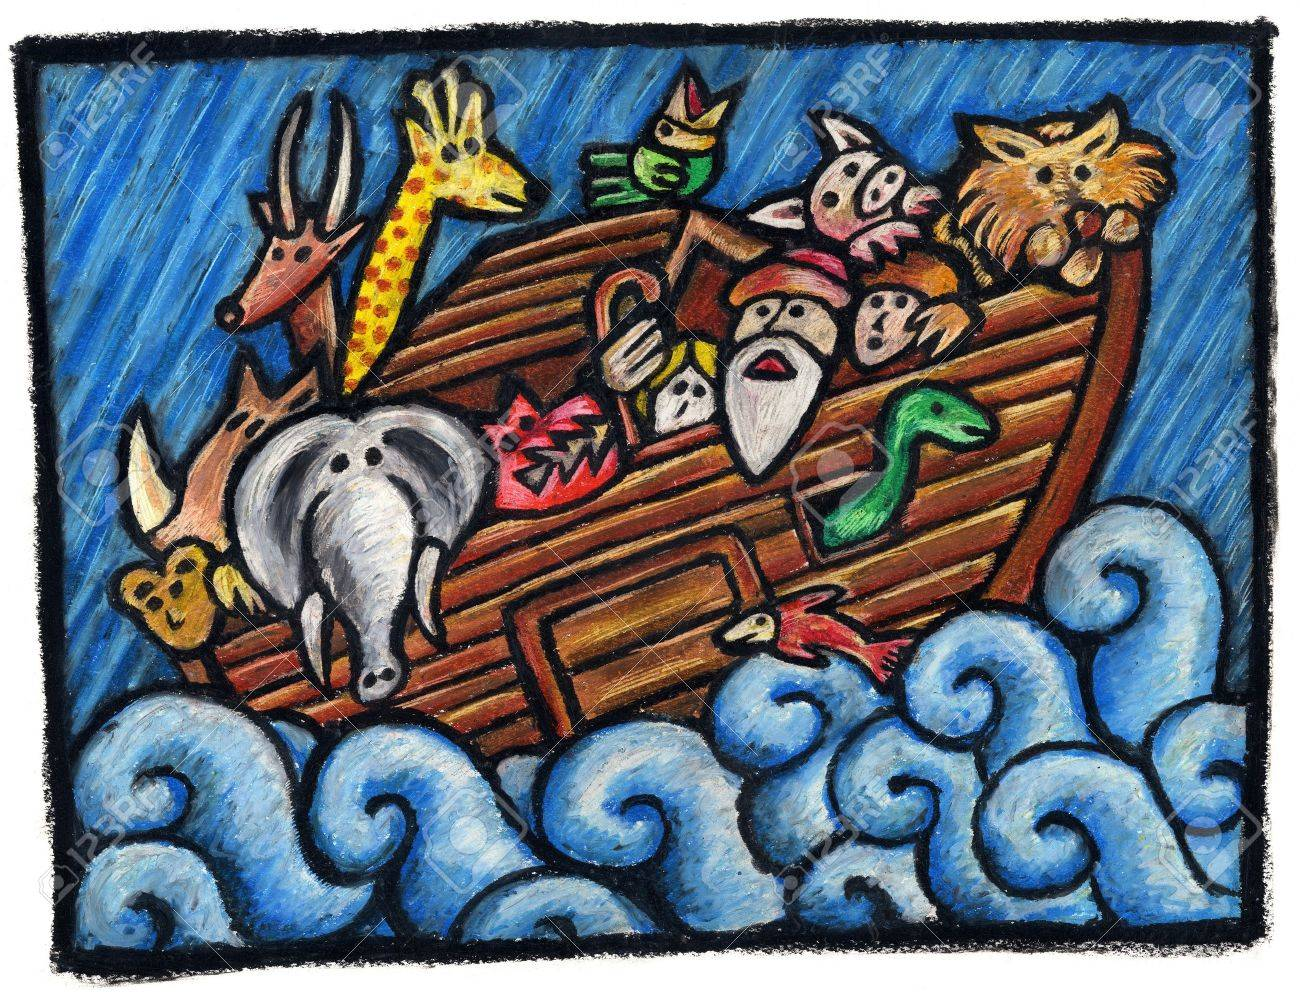 noah u0027s ark illustration noah u0027s animals are waiting for the end